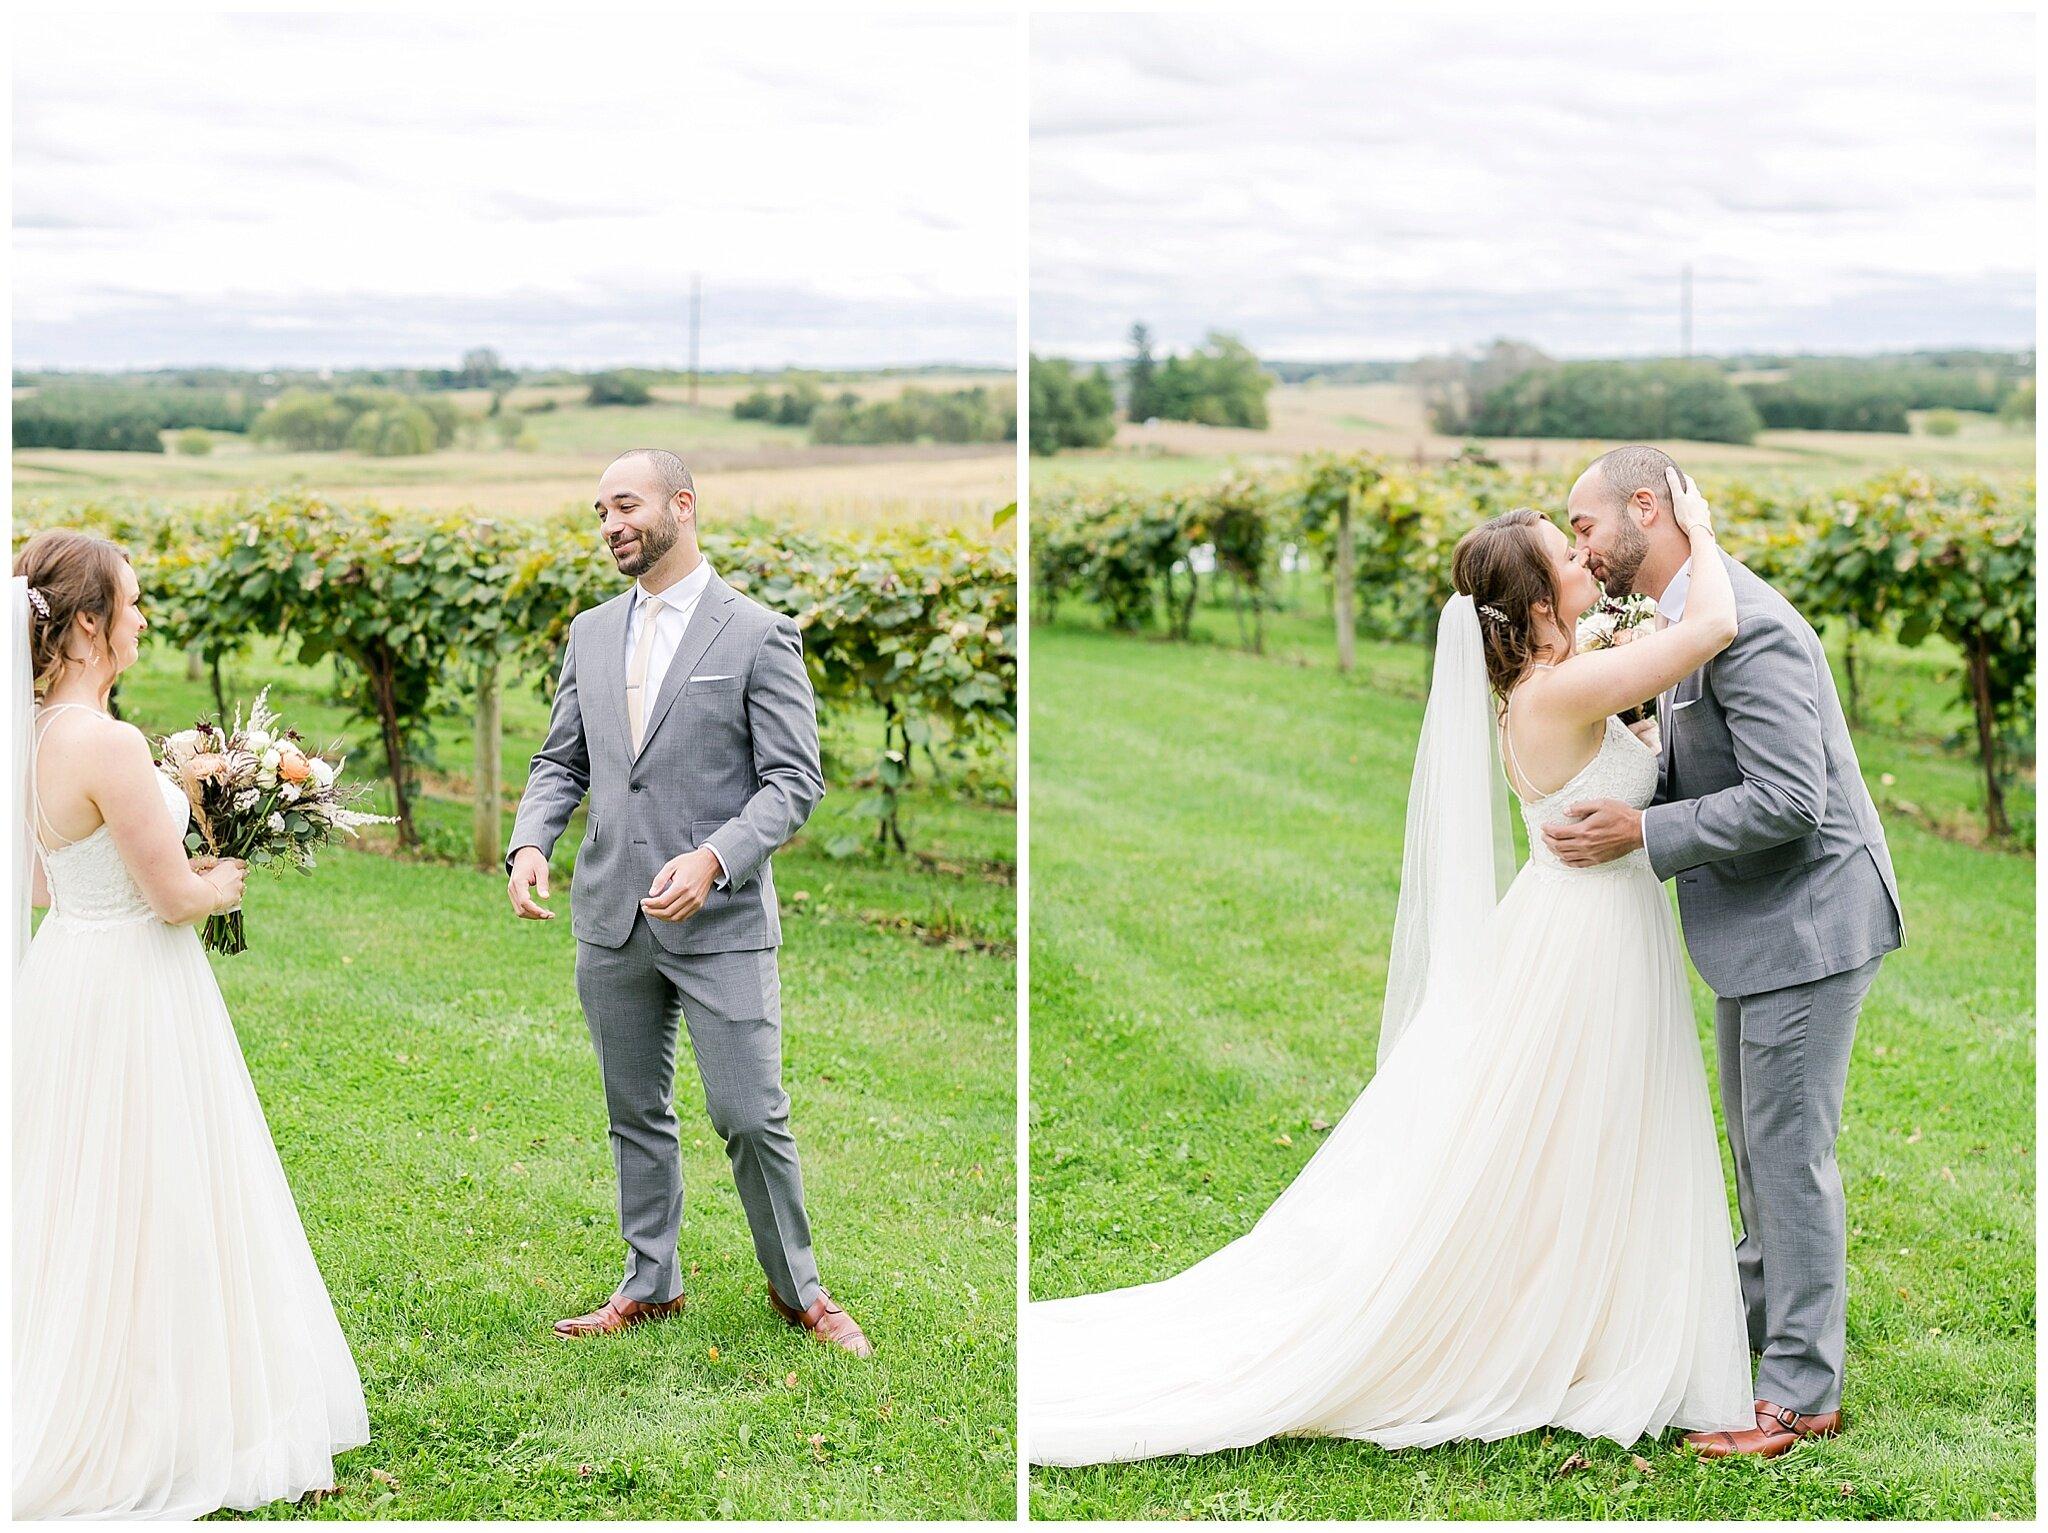 over_the_vines_edgerton_wisconsin_wedding_madison_wisconsin_photographer_0415.jpg